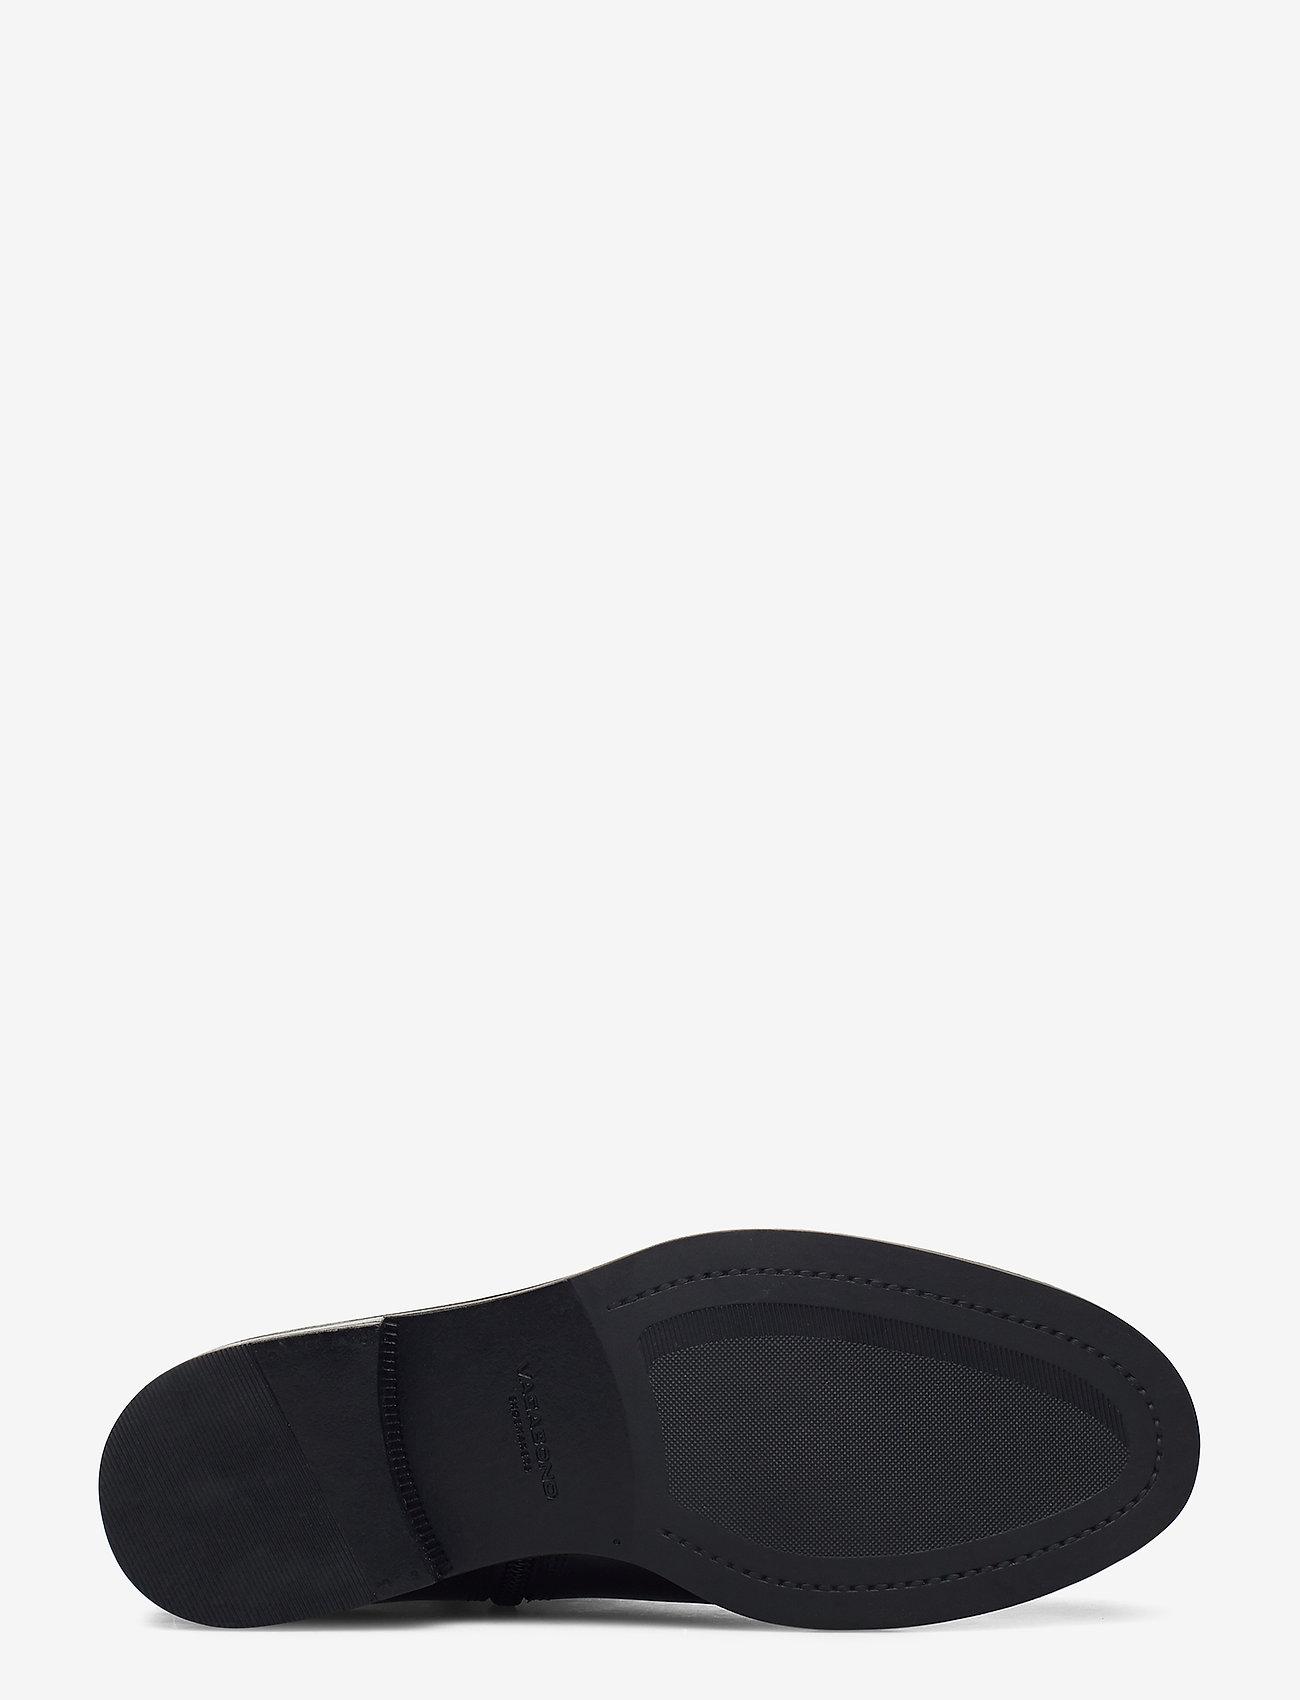 VAGABOND - AMINA - niski obcas - black - 4